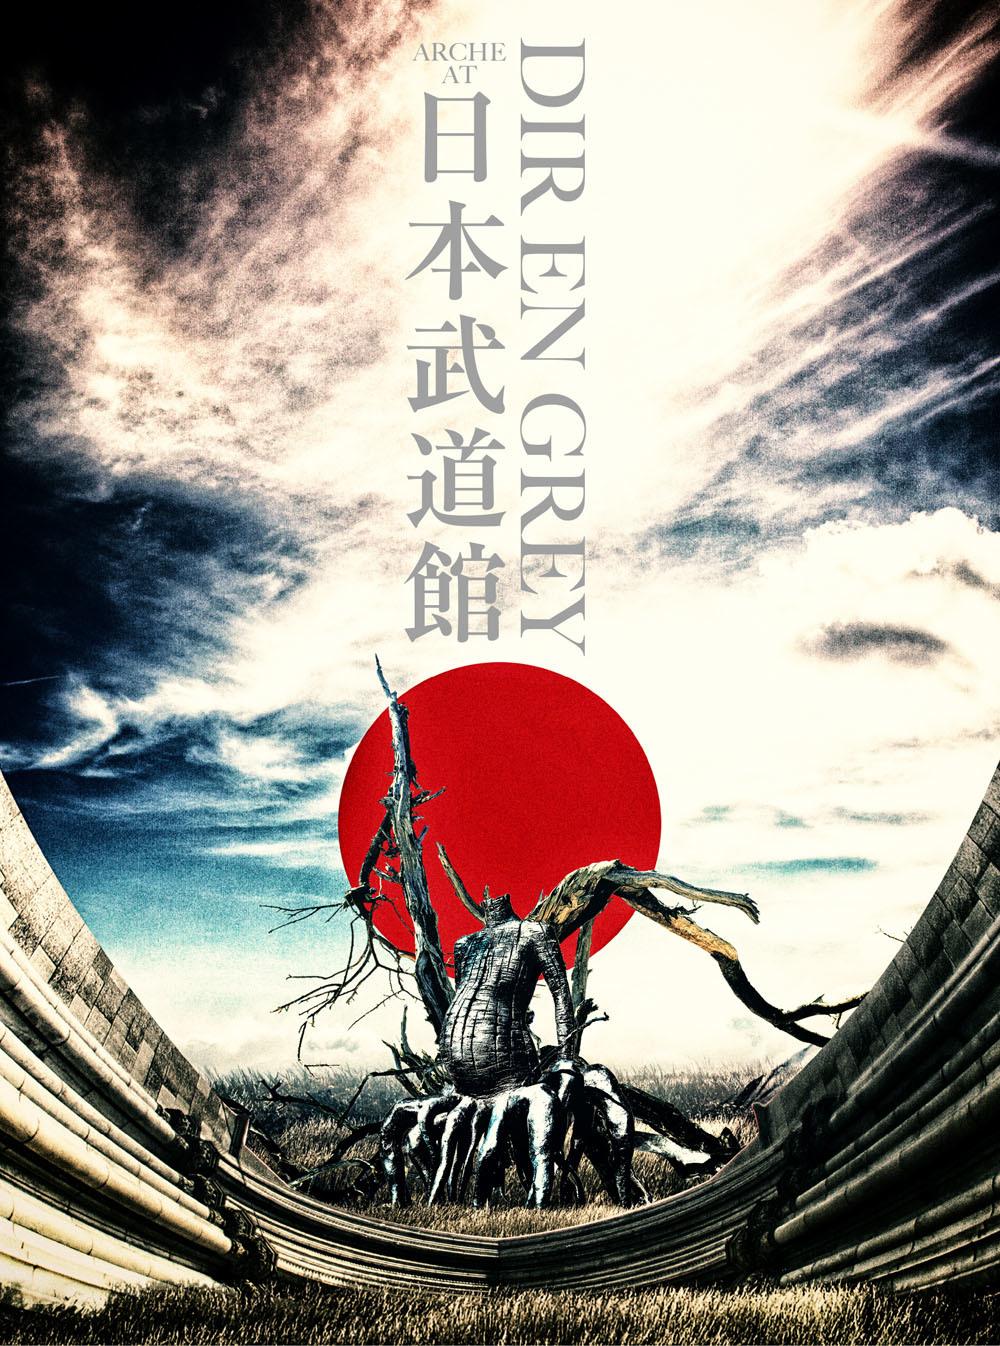 DIR EN GREY『ARCHE AT NIPPON BUDOKAN』Blu-ray & DVD初回生産限定盤